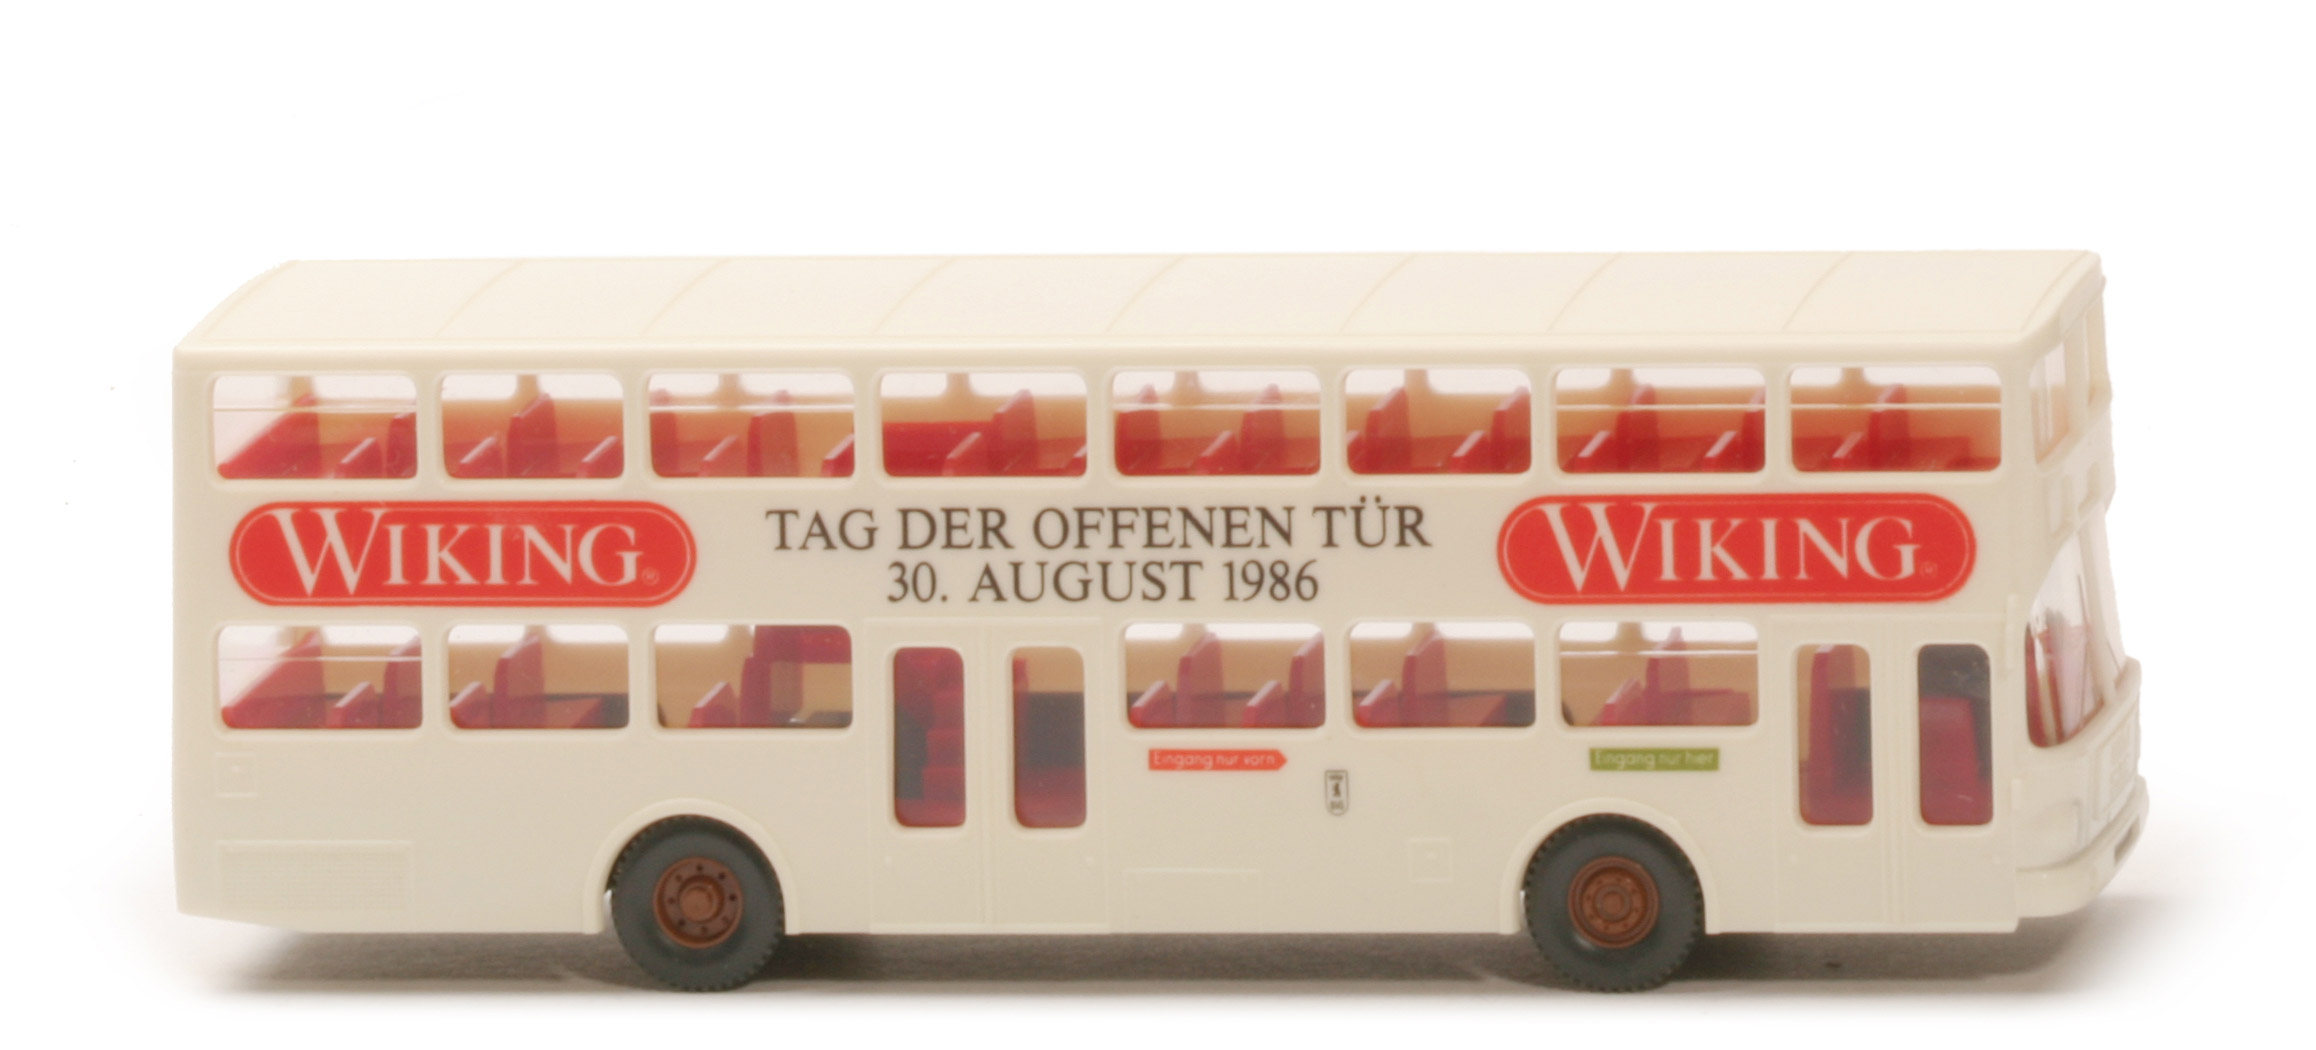 kneule 39 s wiking standards man sd 200 doppeldeck bus wiking tag der offenen t r. Black Bedroom Furniture Sets. Home Design Ideas